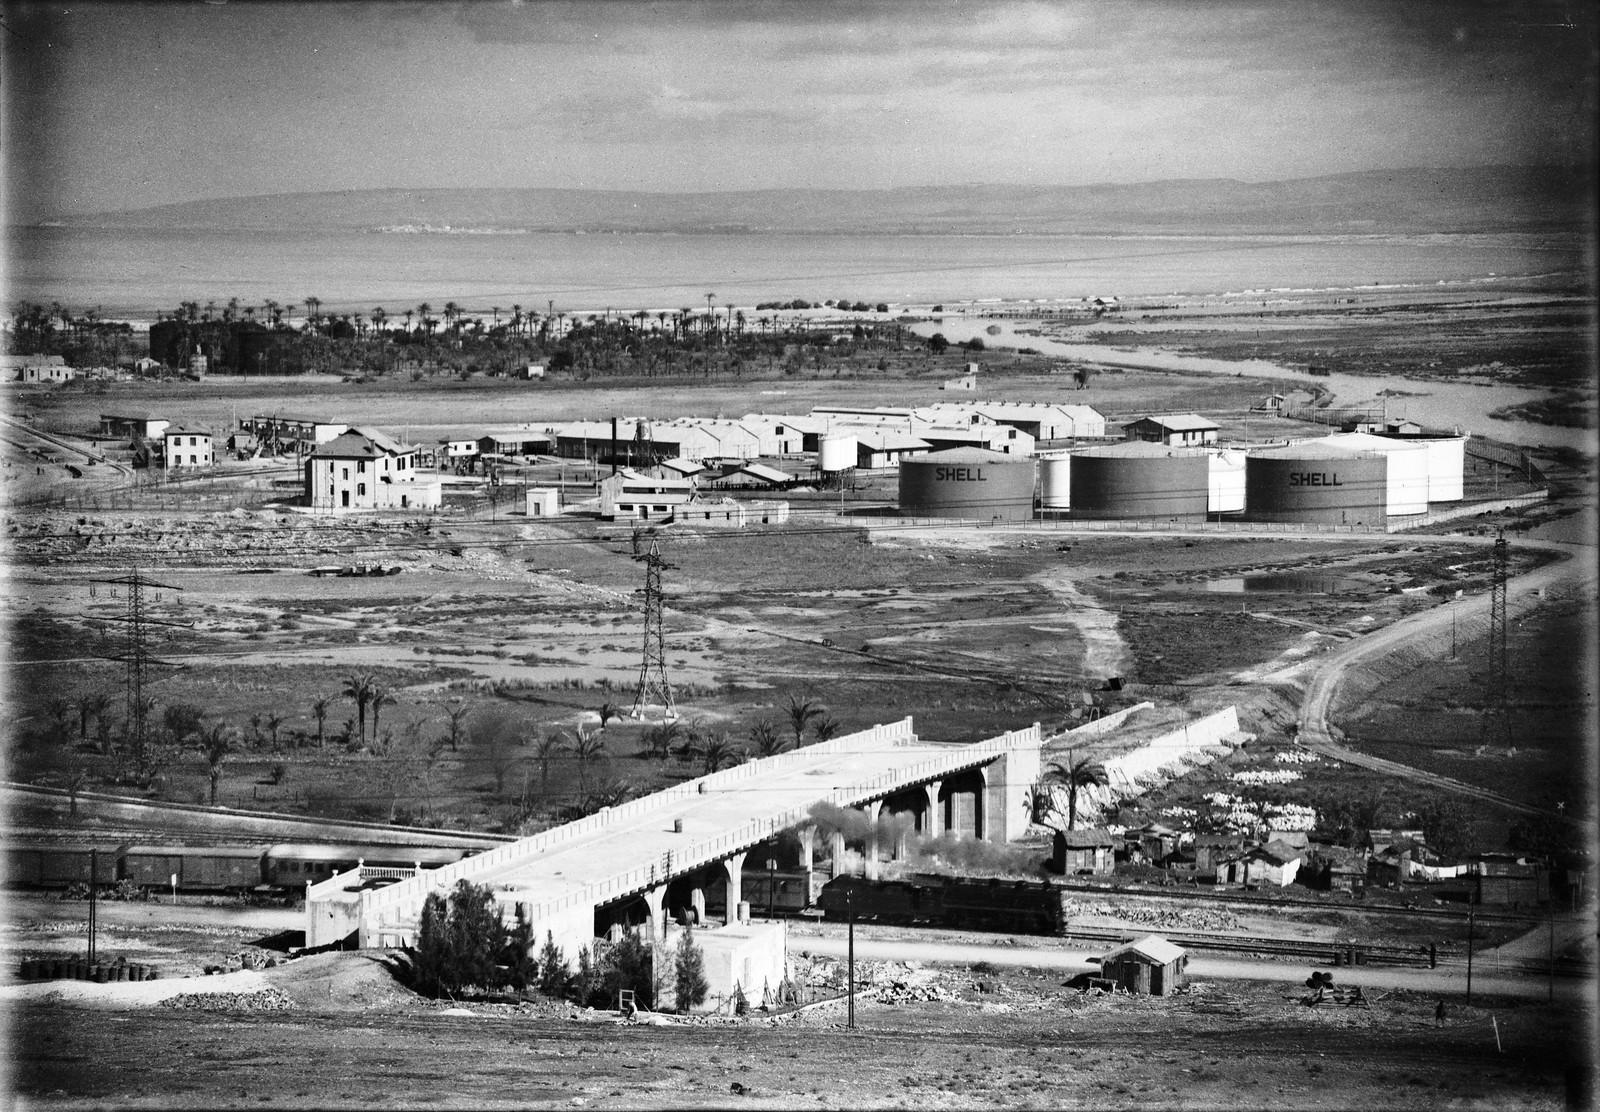 Нефтяные резервуары Шелл около Хайфы